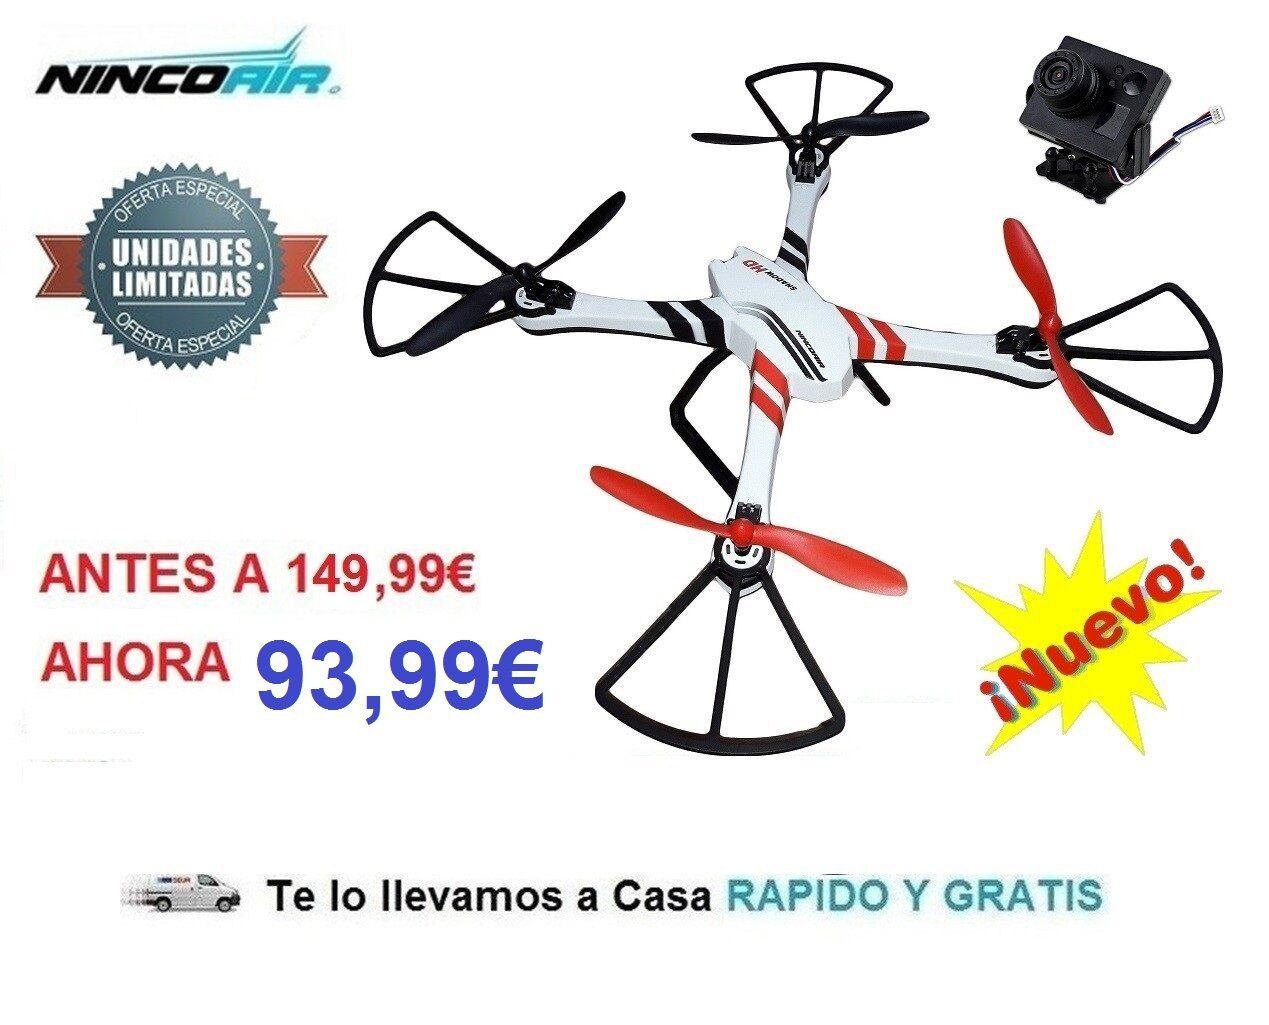 Drone Radiocontrol Shadow Con Cámara HD 3D 2,4Ghz Dron Rc RTF Ninco NH90093